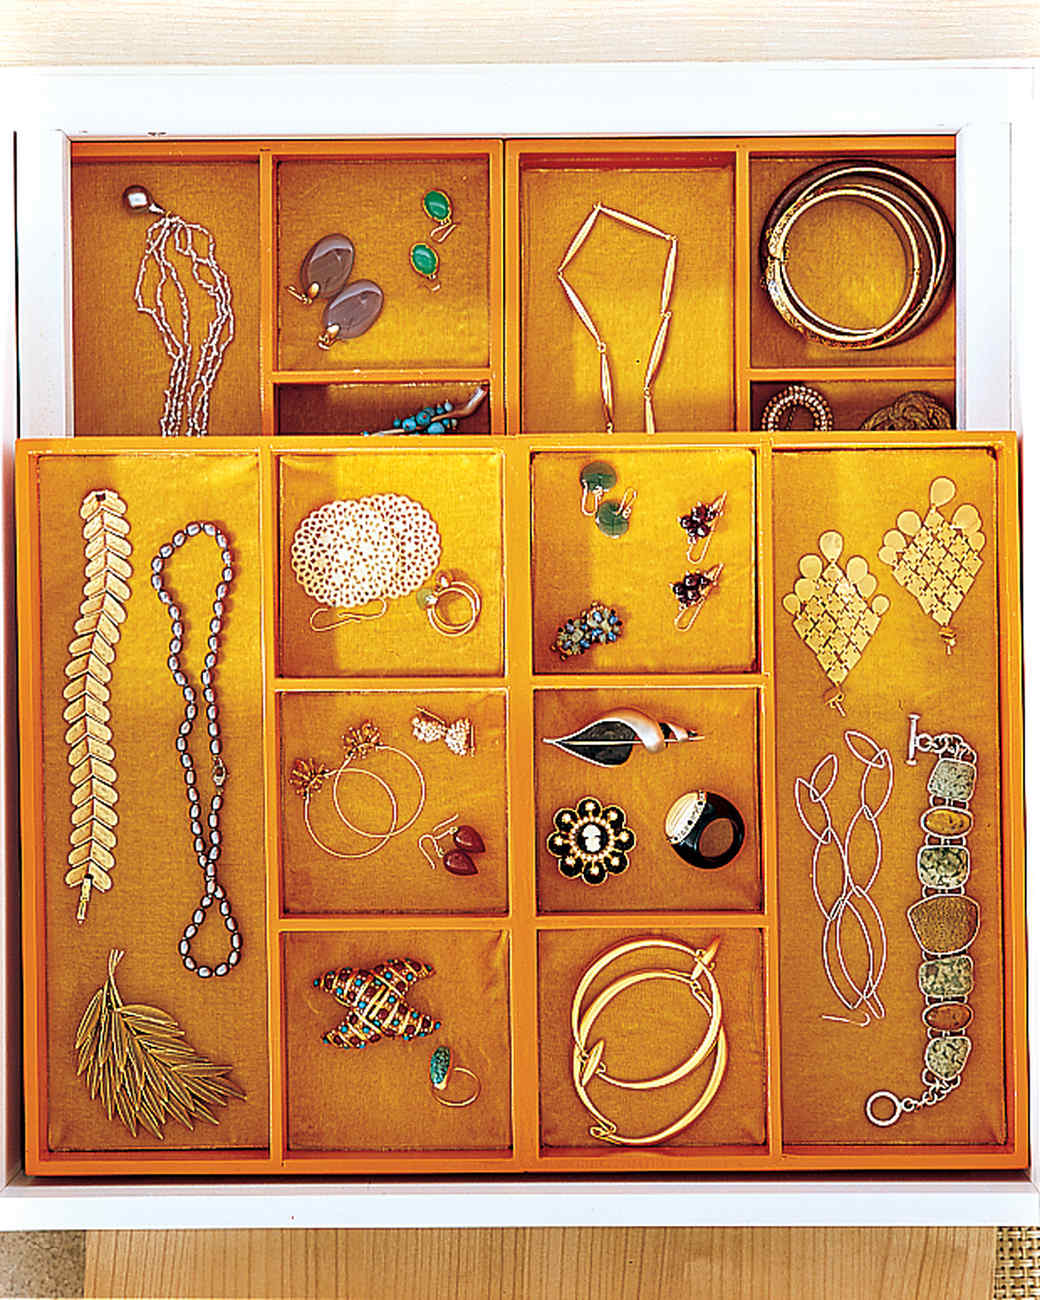 mla_104332_0109_jewelry.jpg